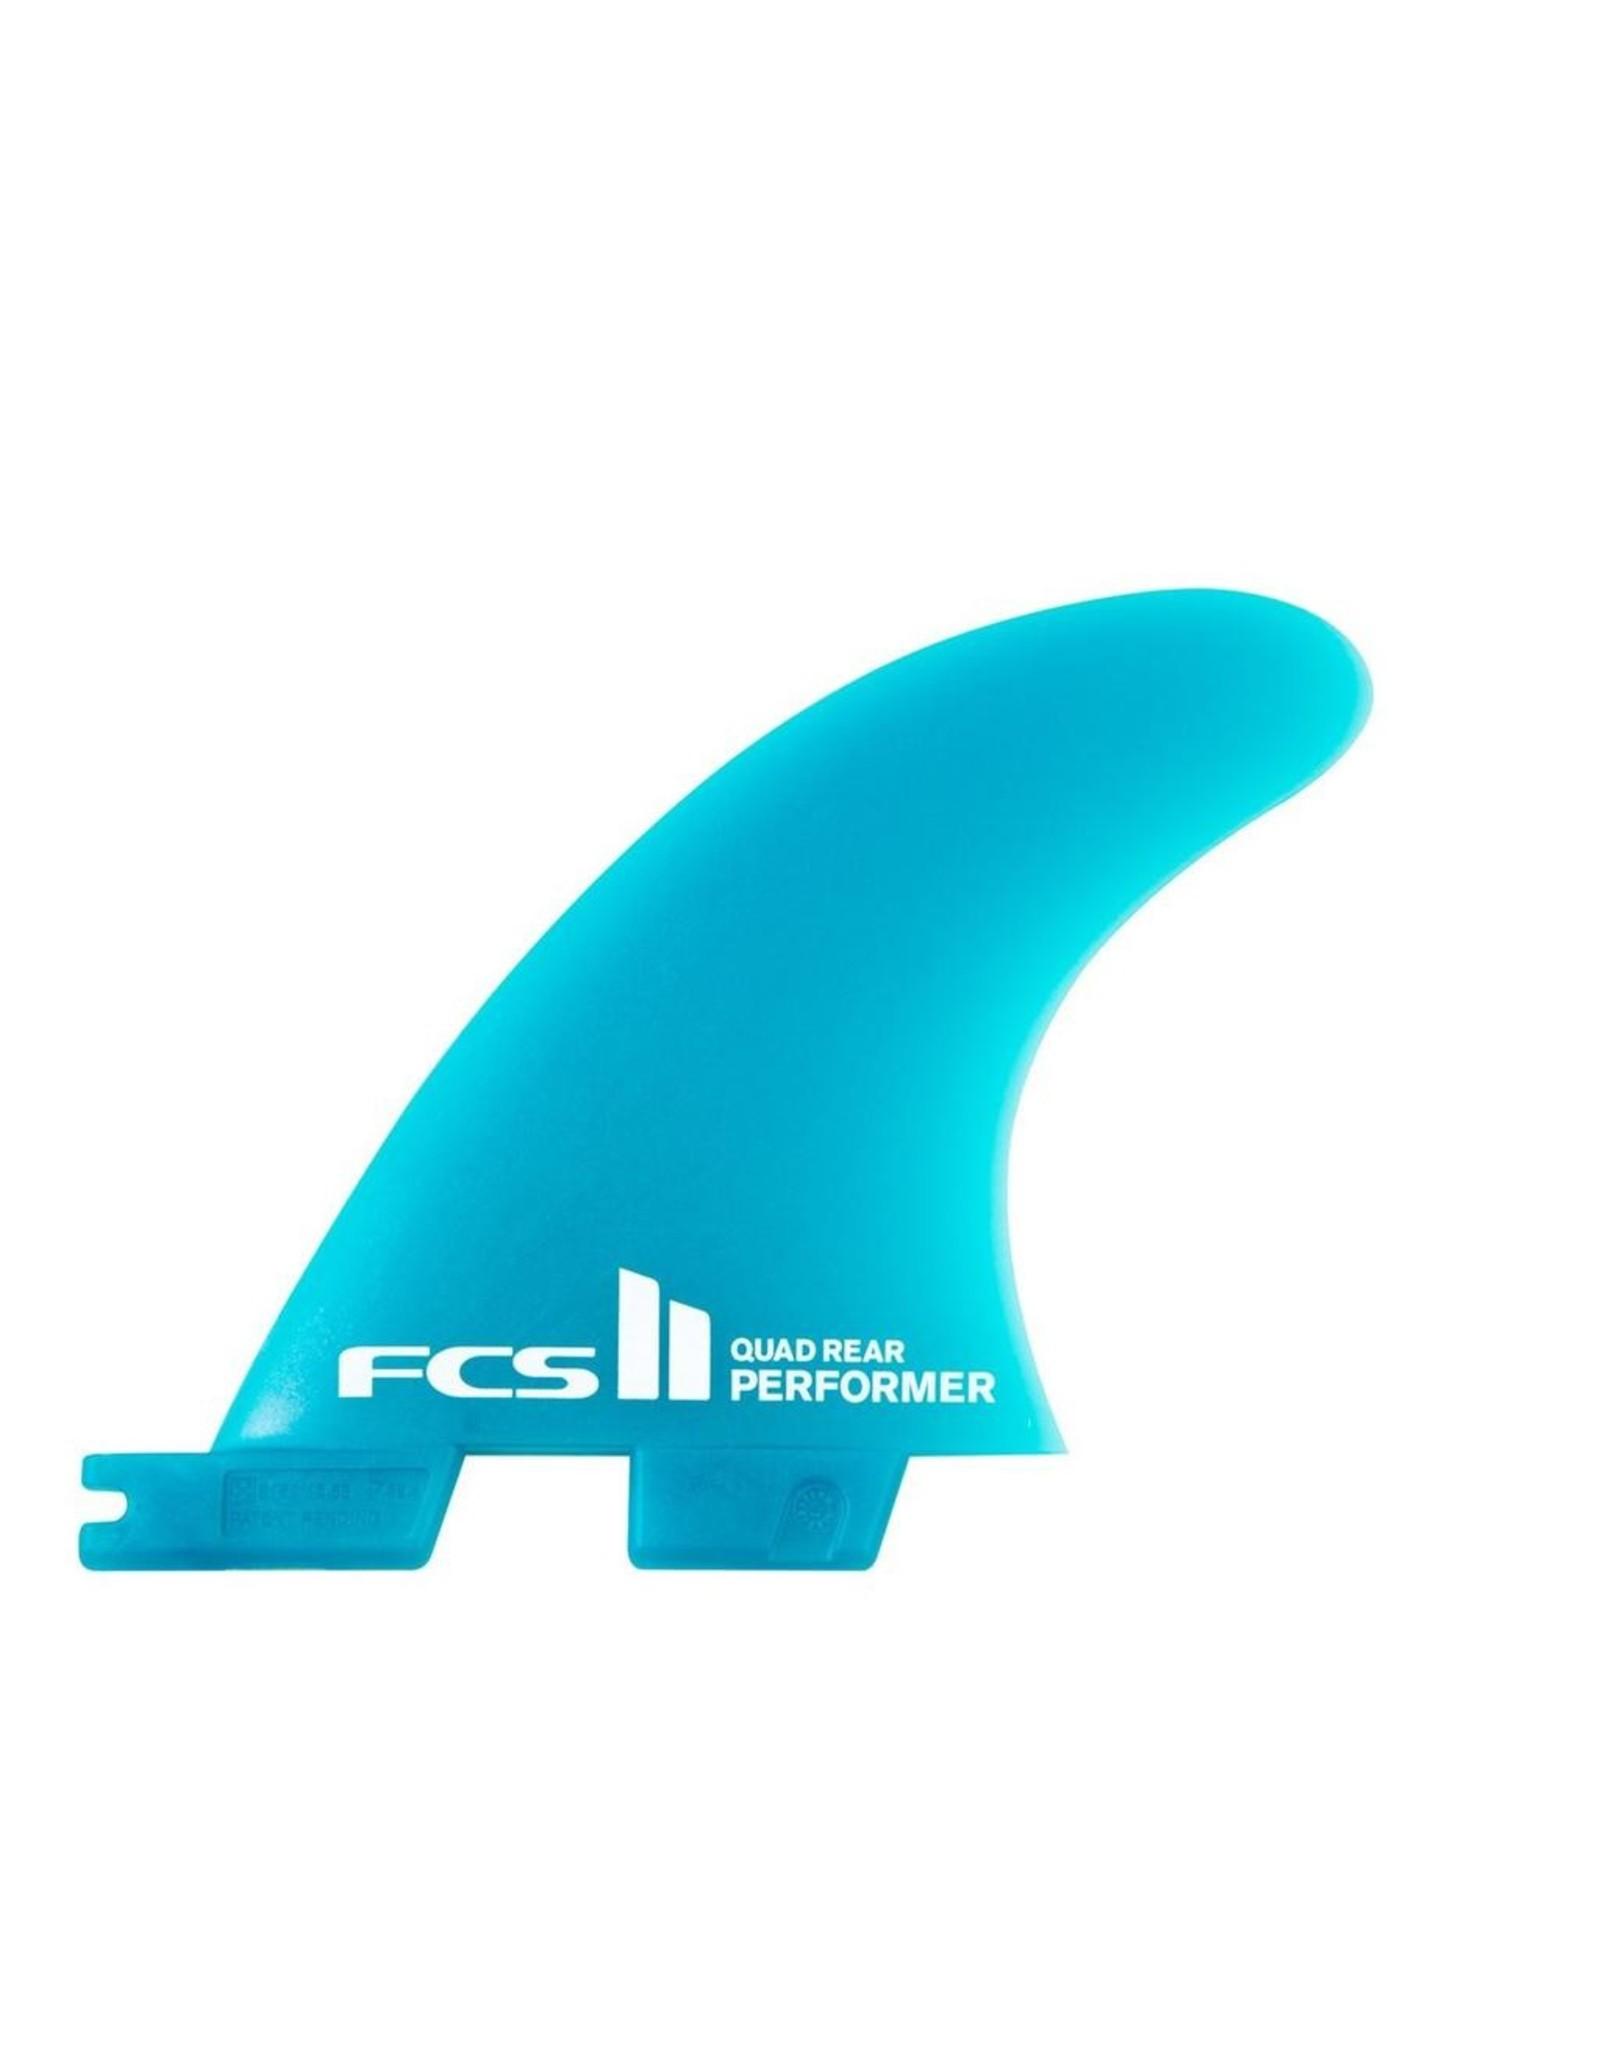 FCS FCS2 - 2Fin - Performer Neo Glass Medium Quad Rear - Teal - Large (75-90kg)